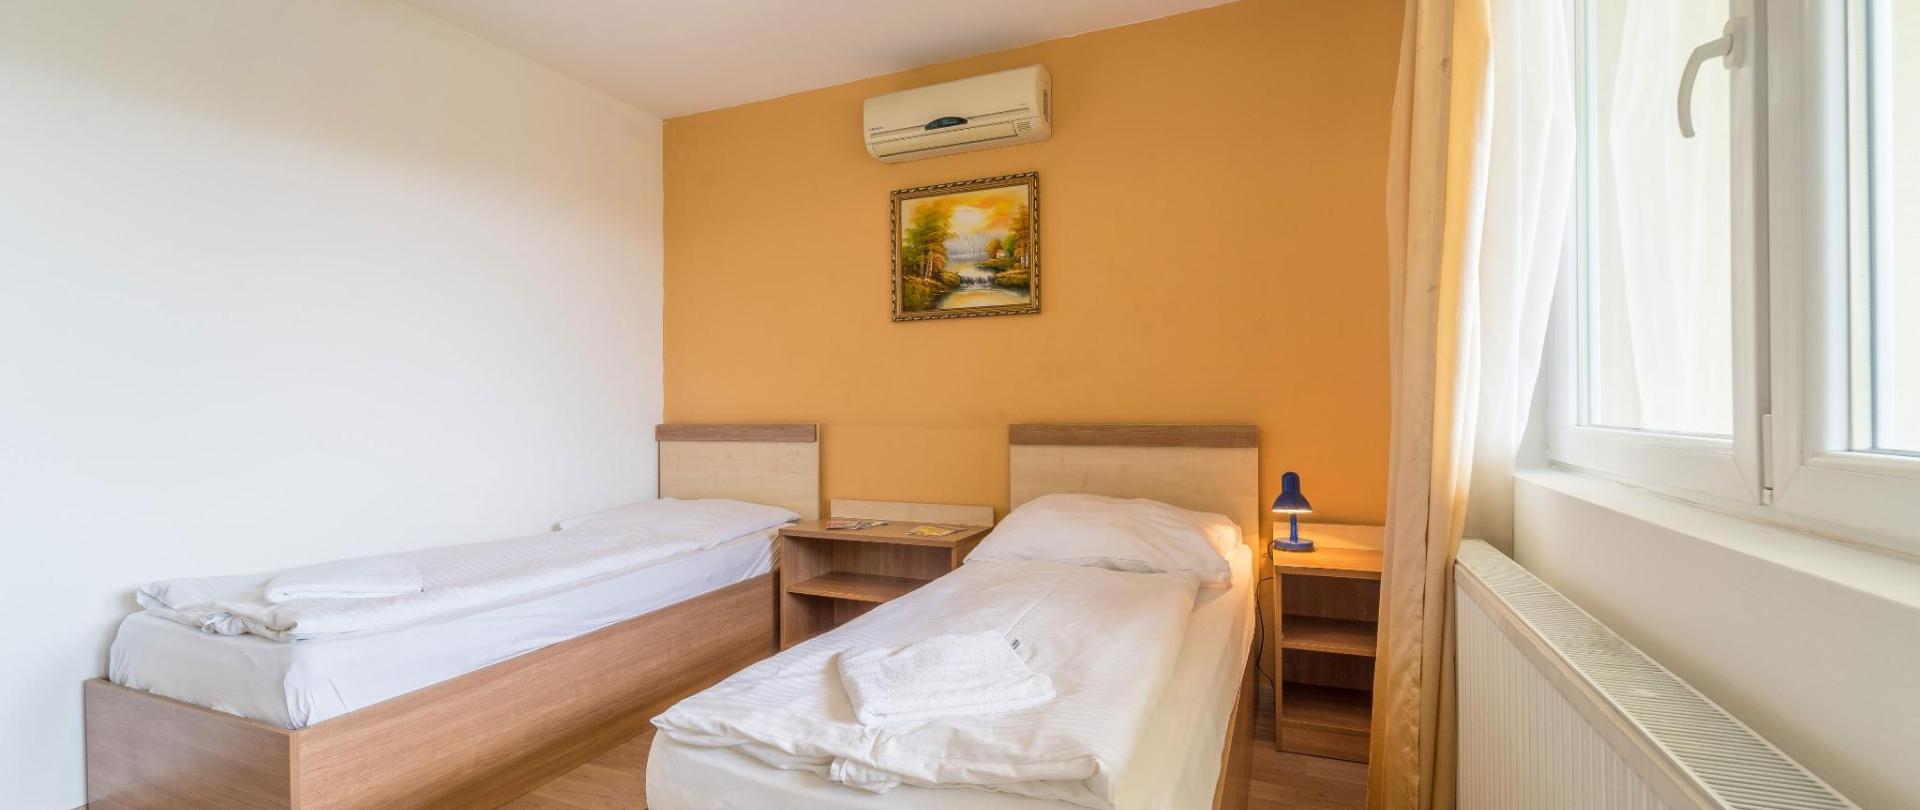 Silver_Hotel (16 of 49).jpg